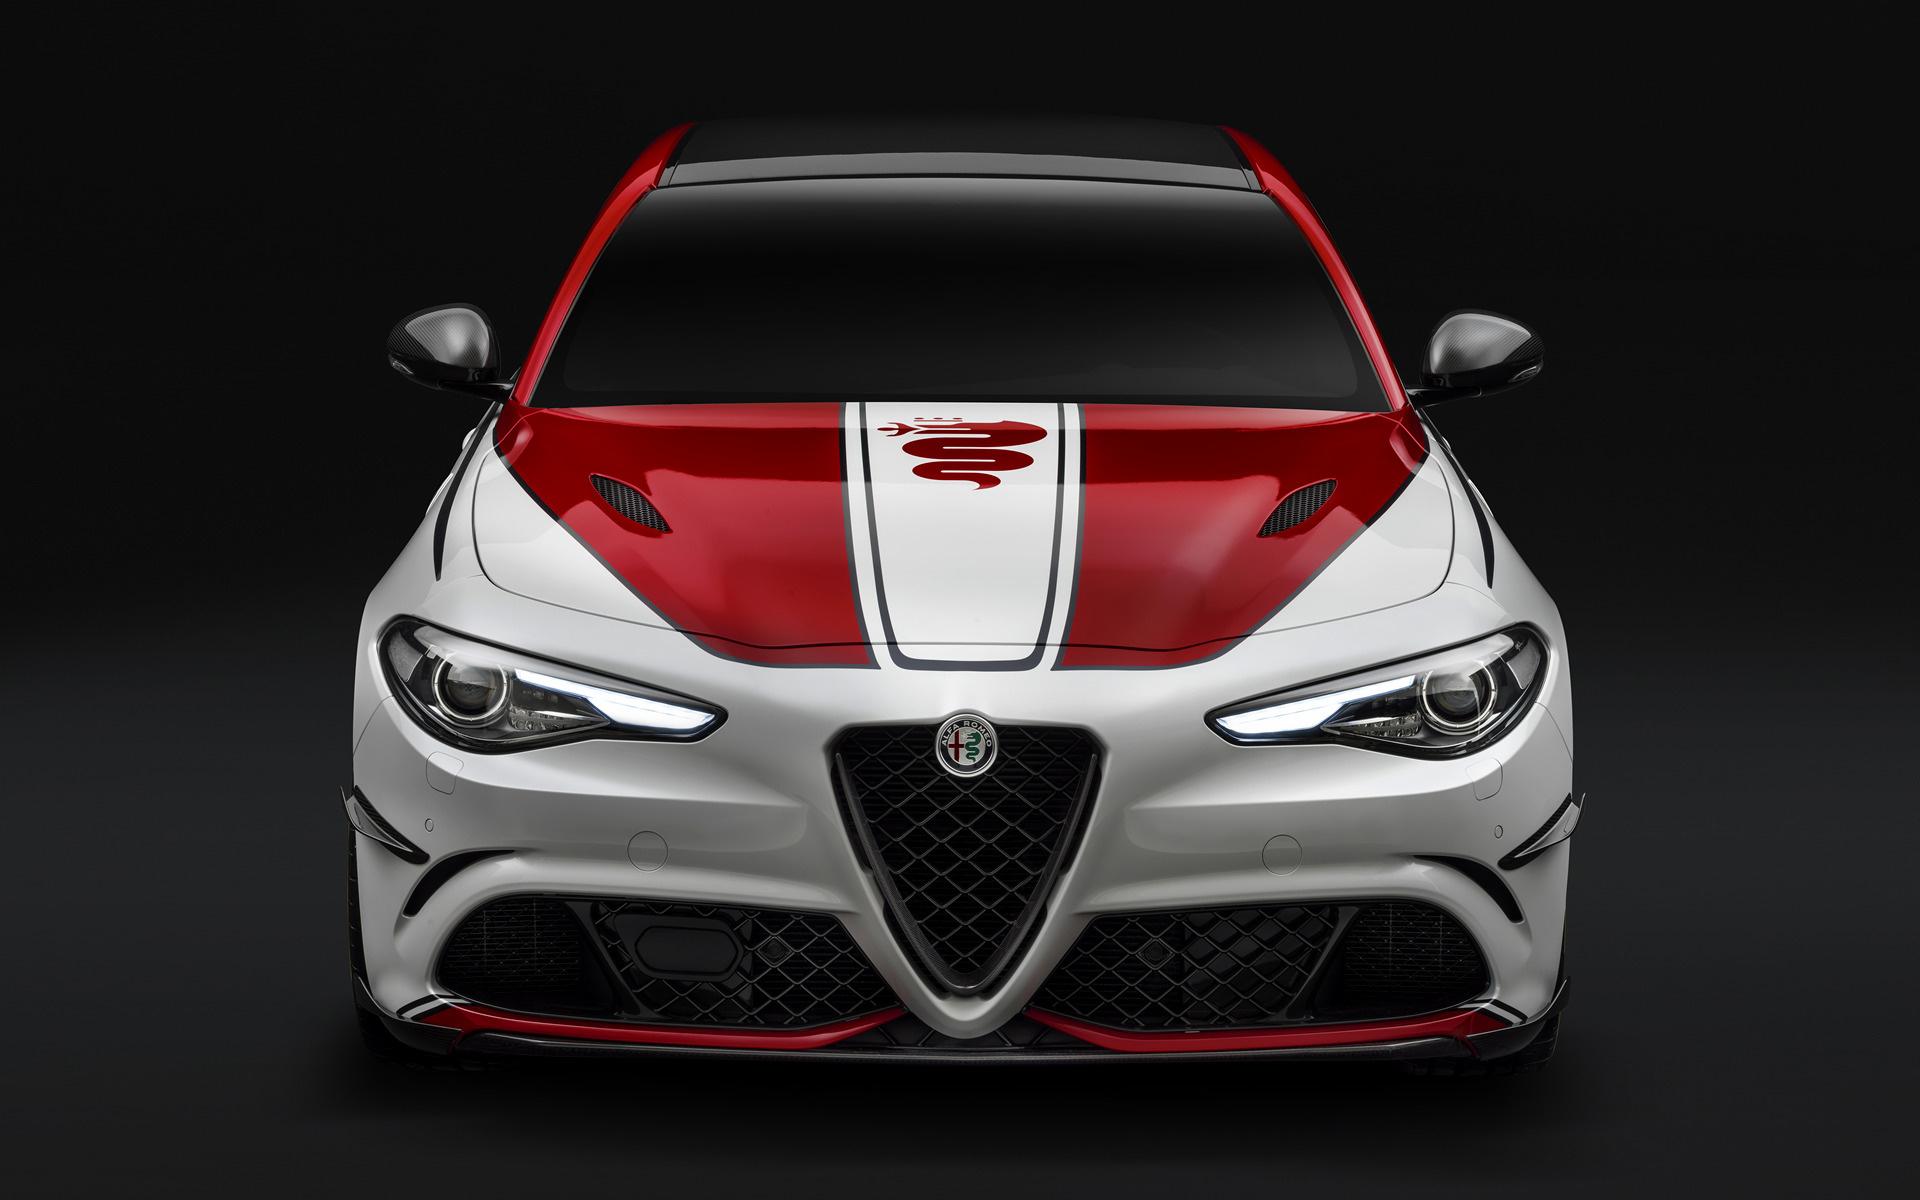 All Car Brands >> 2019 Alfa Romeo Giulia Quadrifoglio Alfa Romeo Racing - Wallpapers and HD Images | Car Pixel